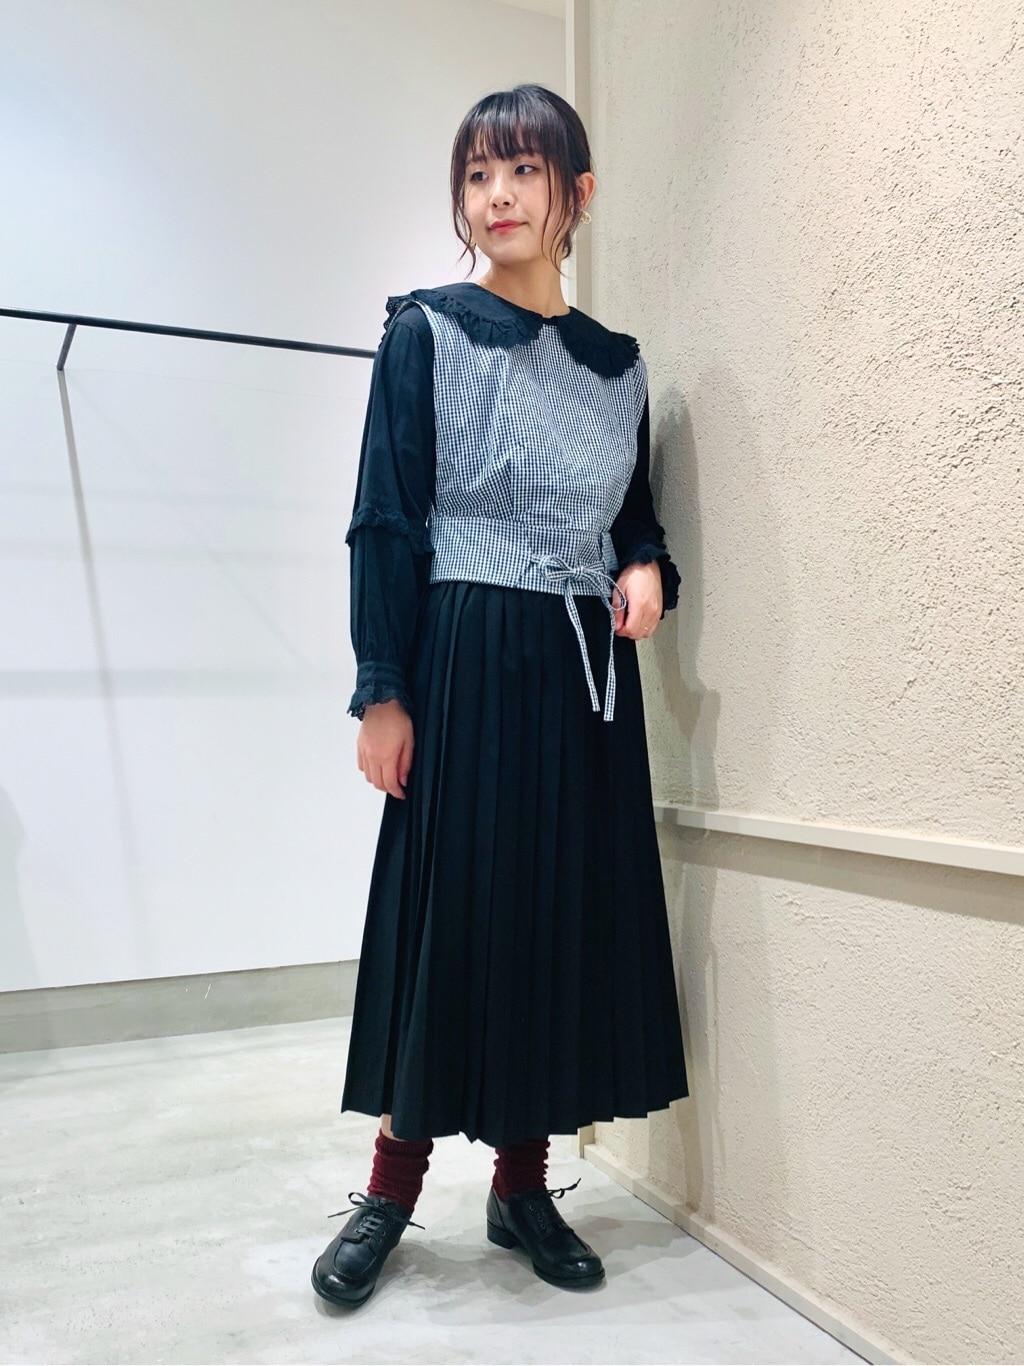 chambre de charme 横浜ジョイナス 身長:162cm 2021.01.11